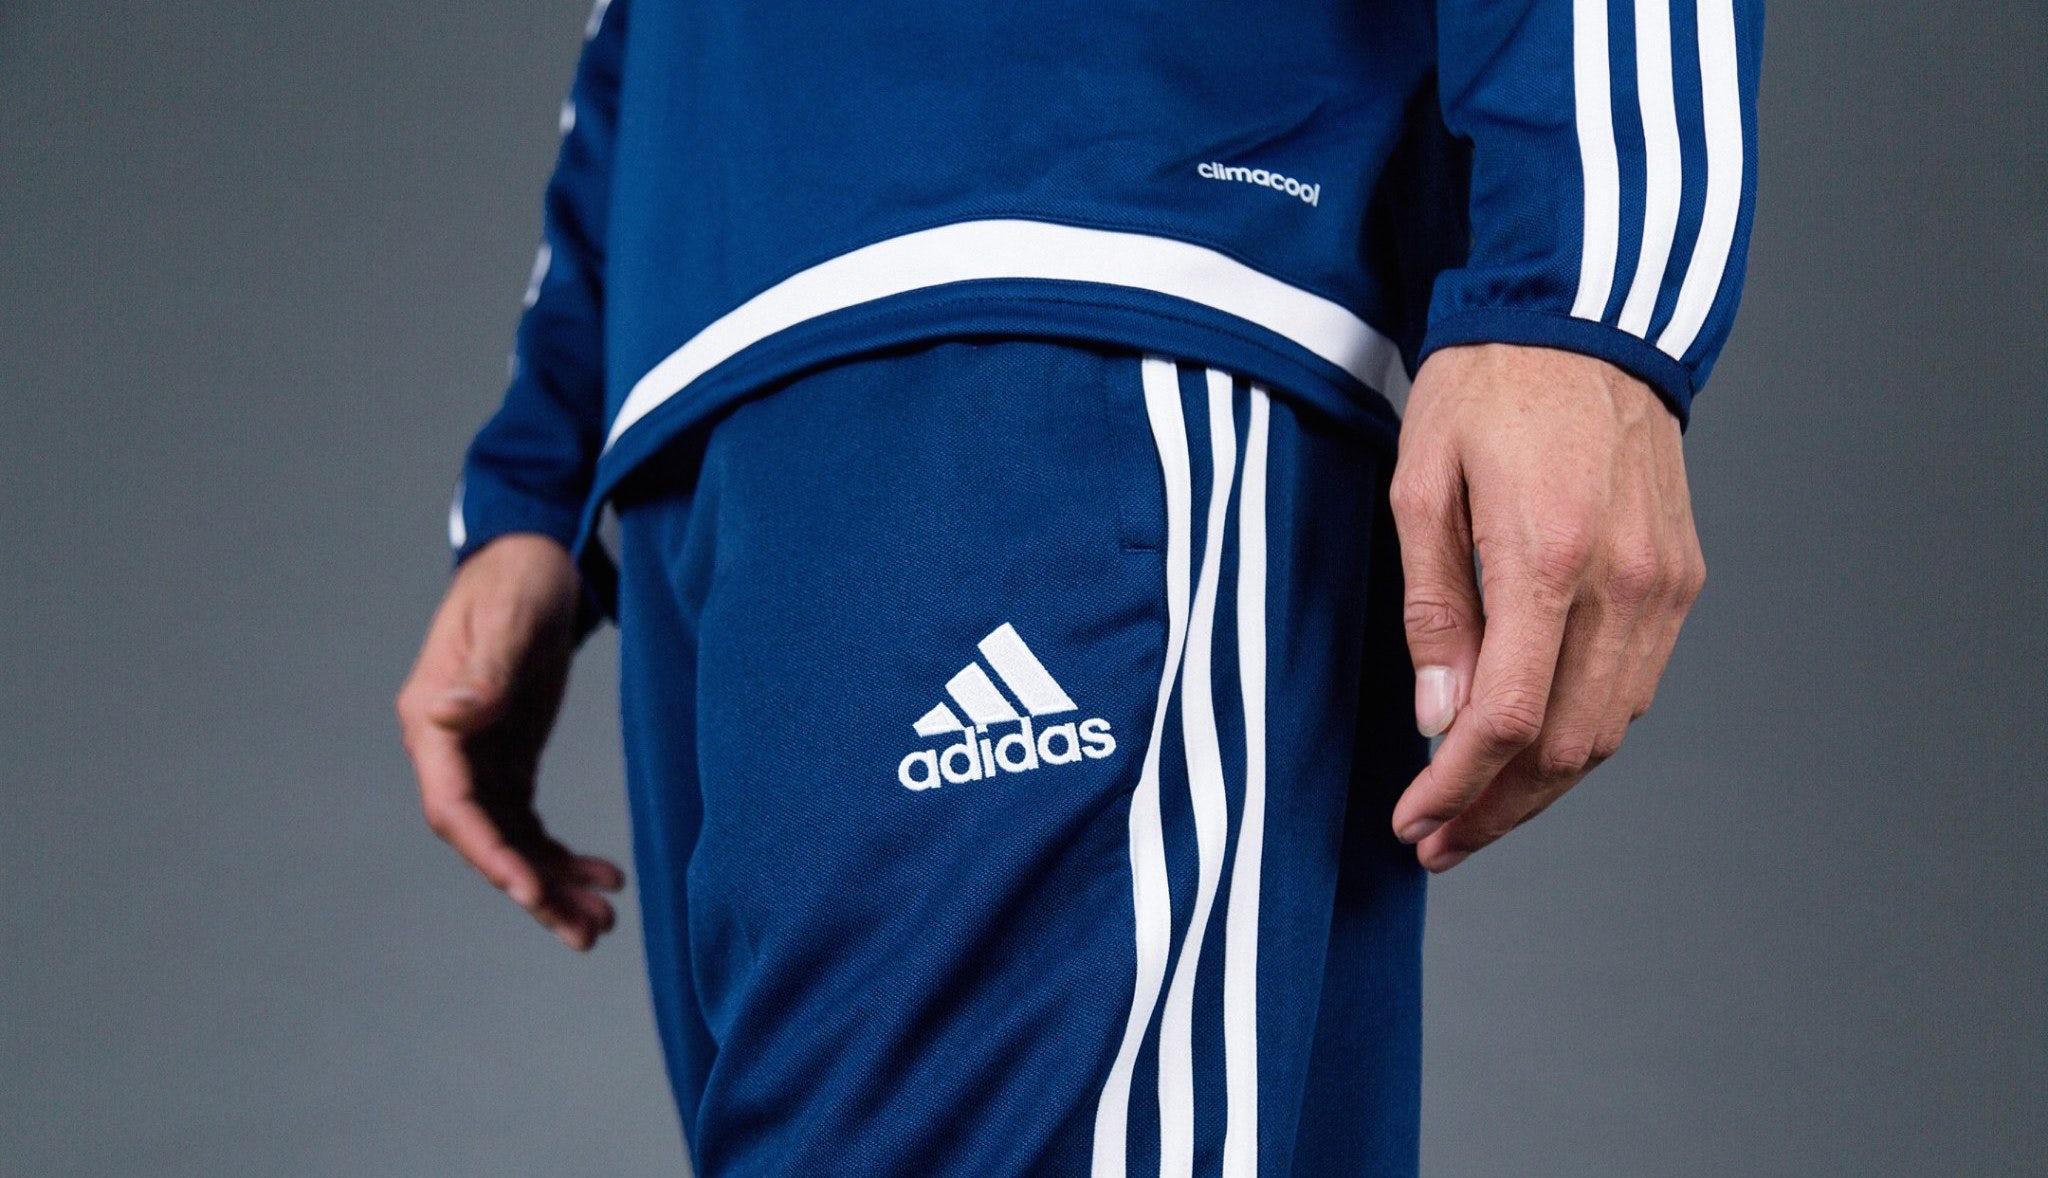 Source: Adidas